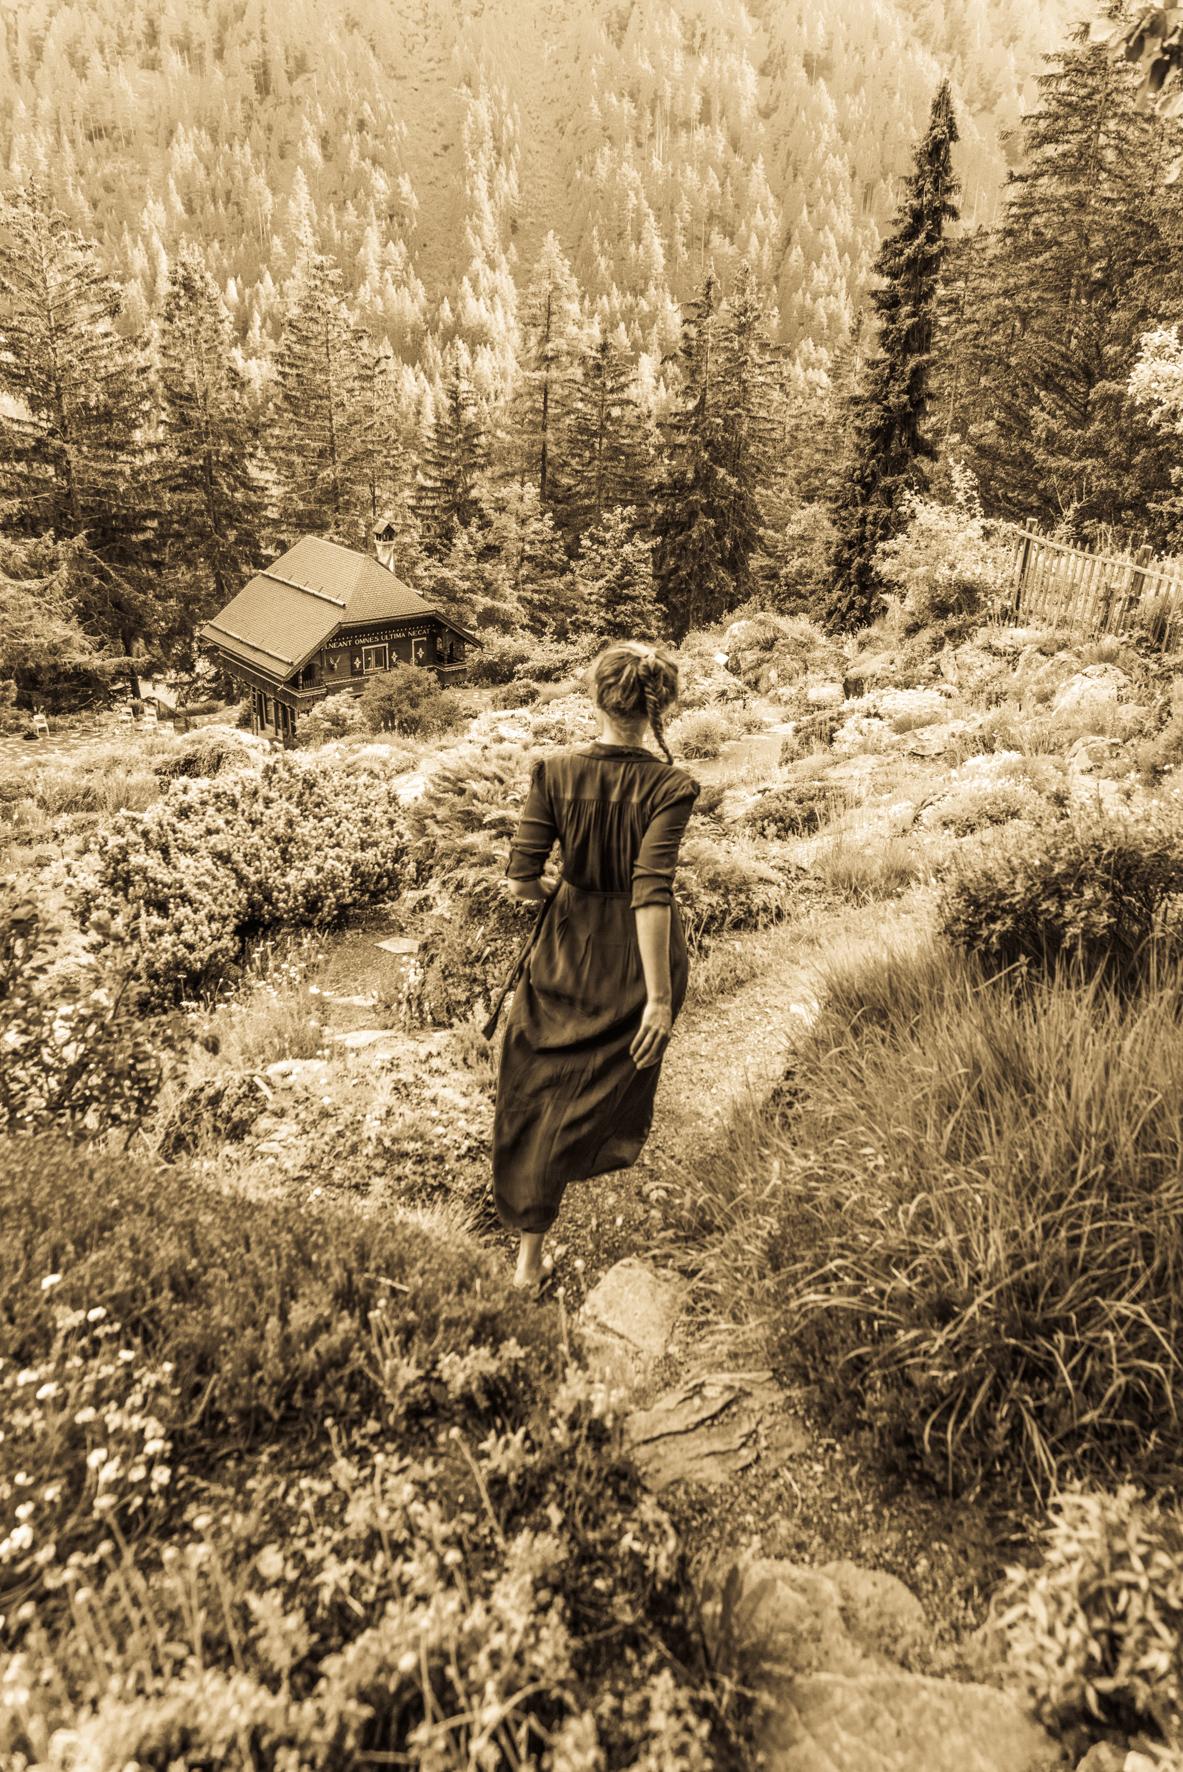 19062021-Flore-Alpe-30272